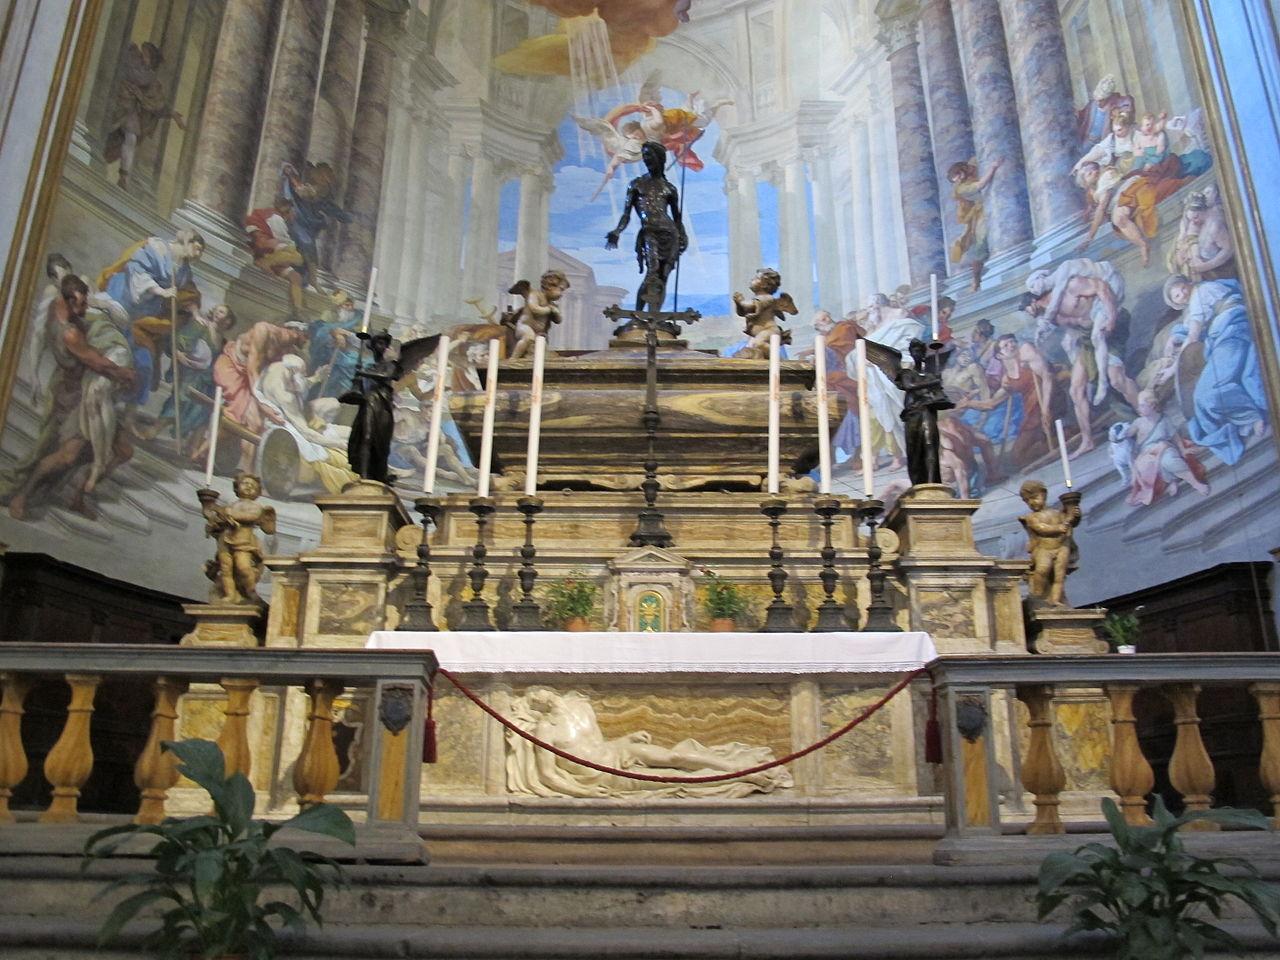 Santissima_Annunziata__Altar